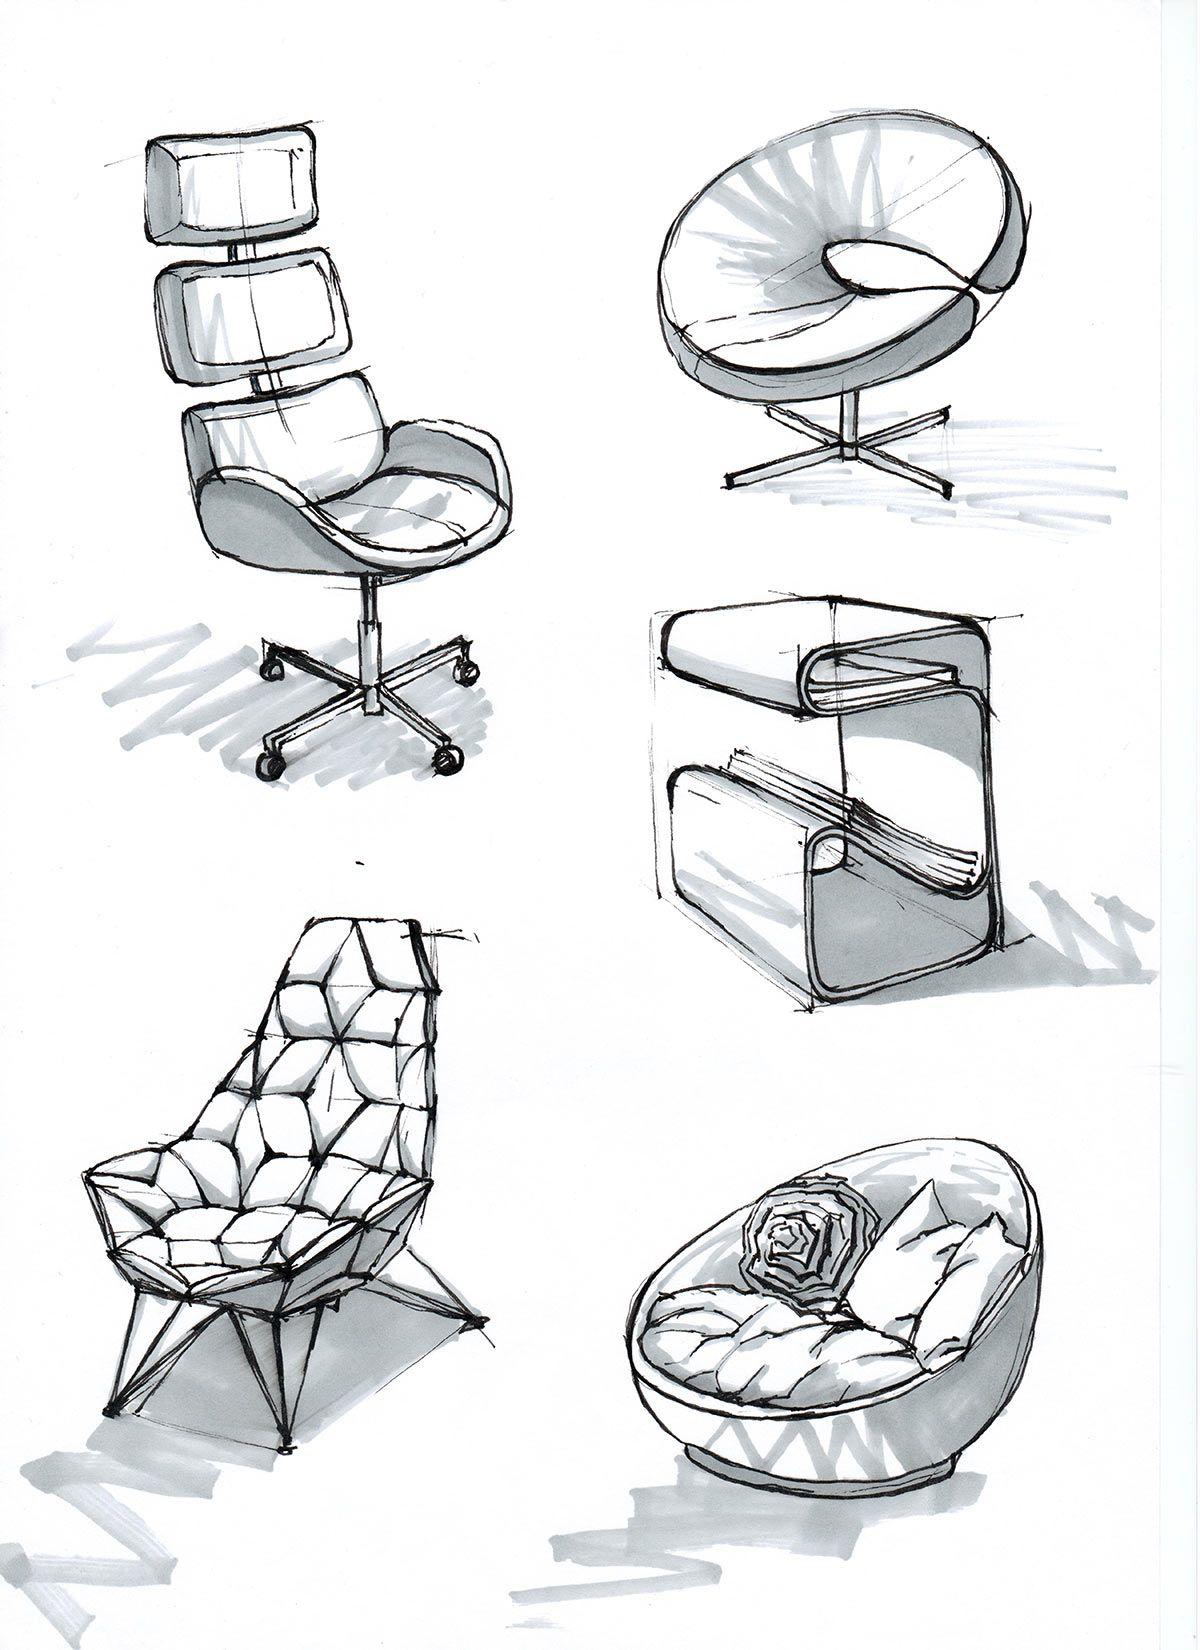 Chair Design Architects Chairs Living Room Ikea Interior Portfolio Sketch Pinterest Sketches